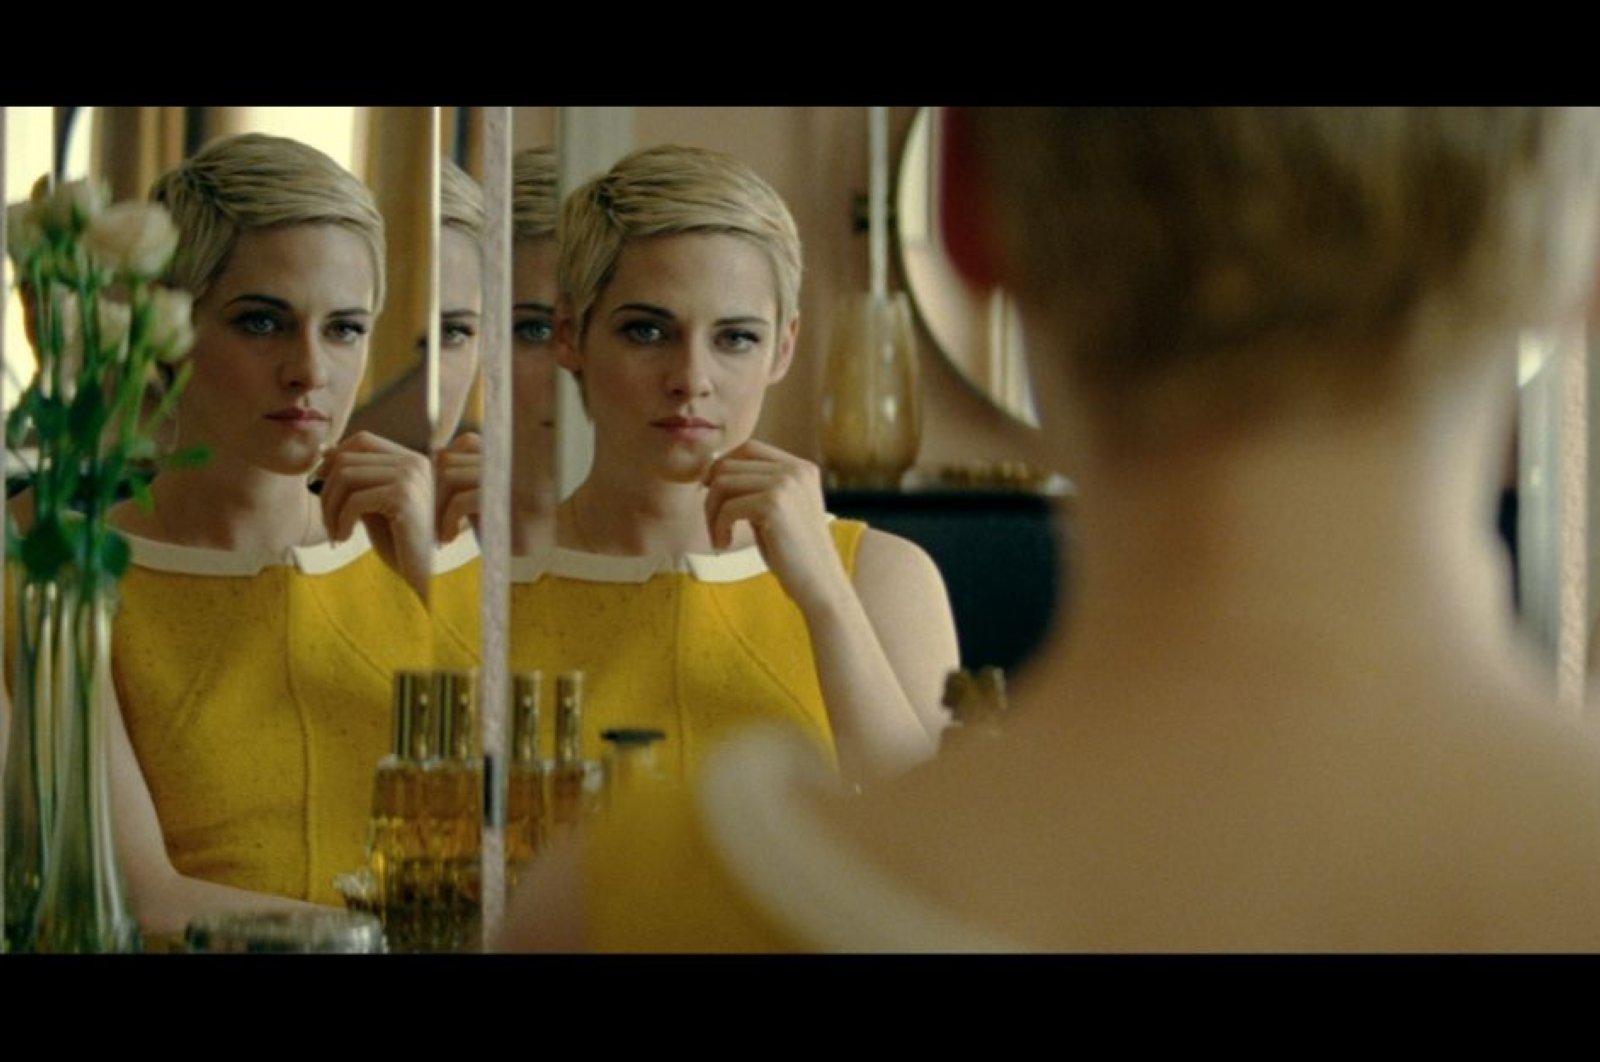 Kristen Stewart as Seberg in the film.